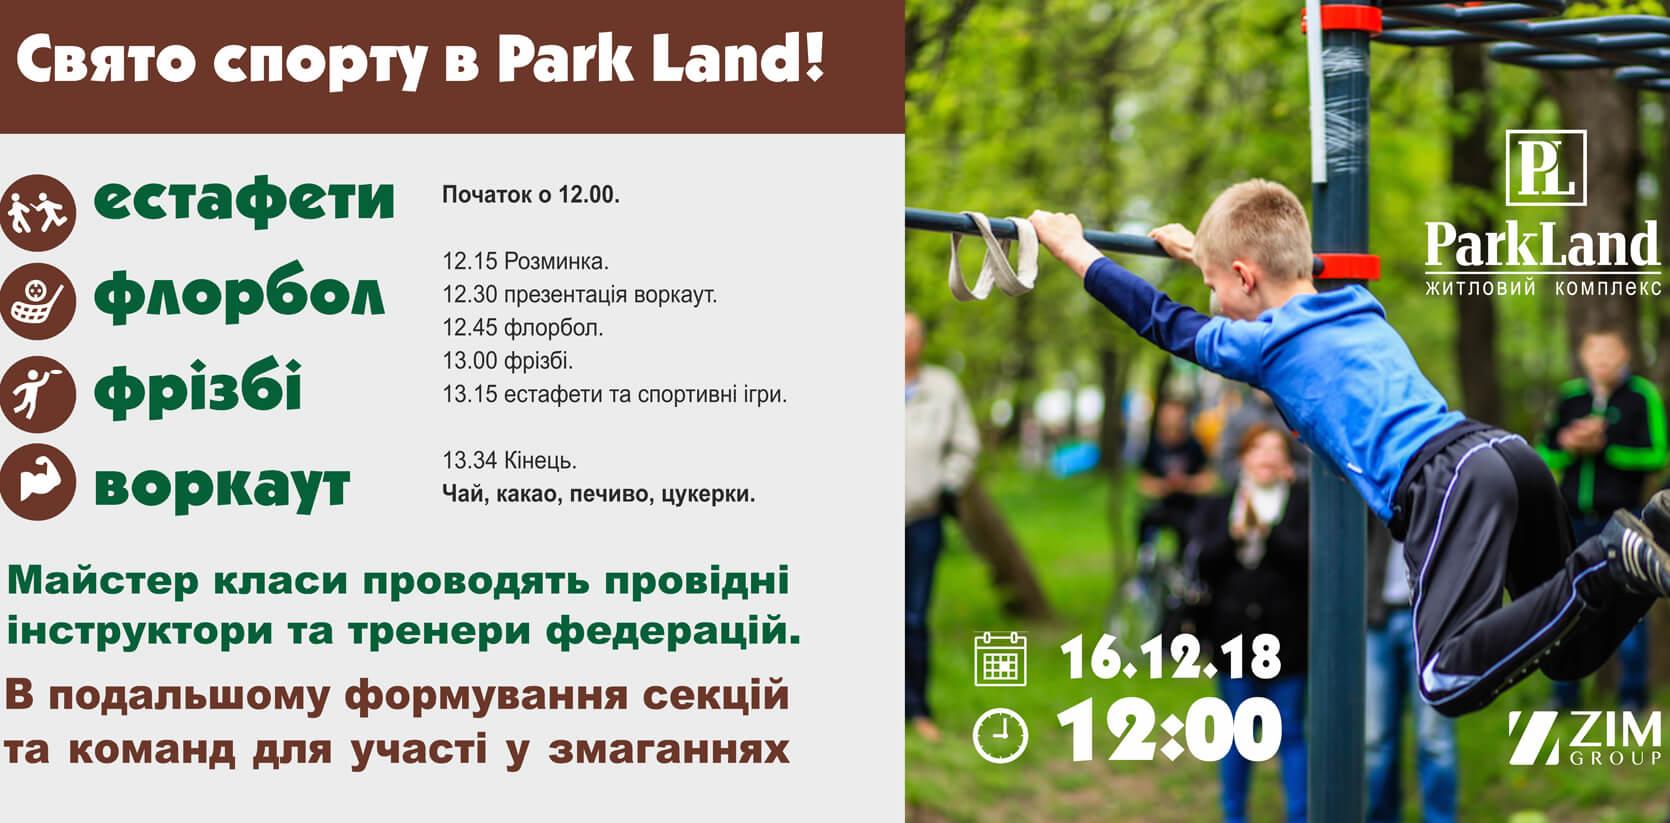 parkland-news-011218-ukr-small-2